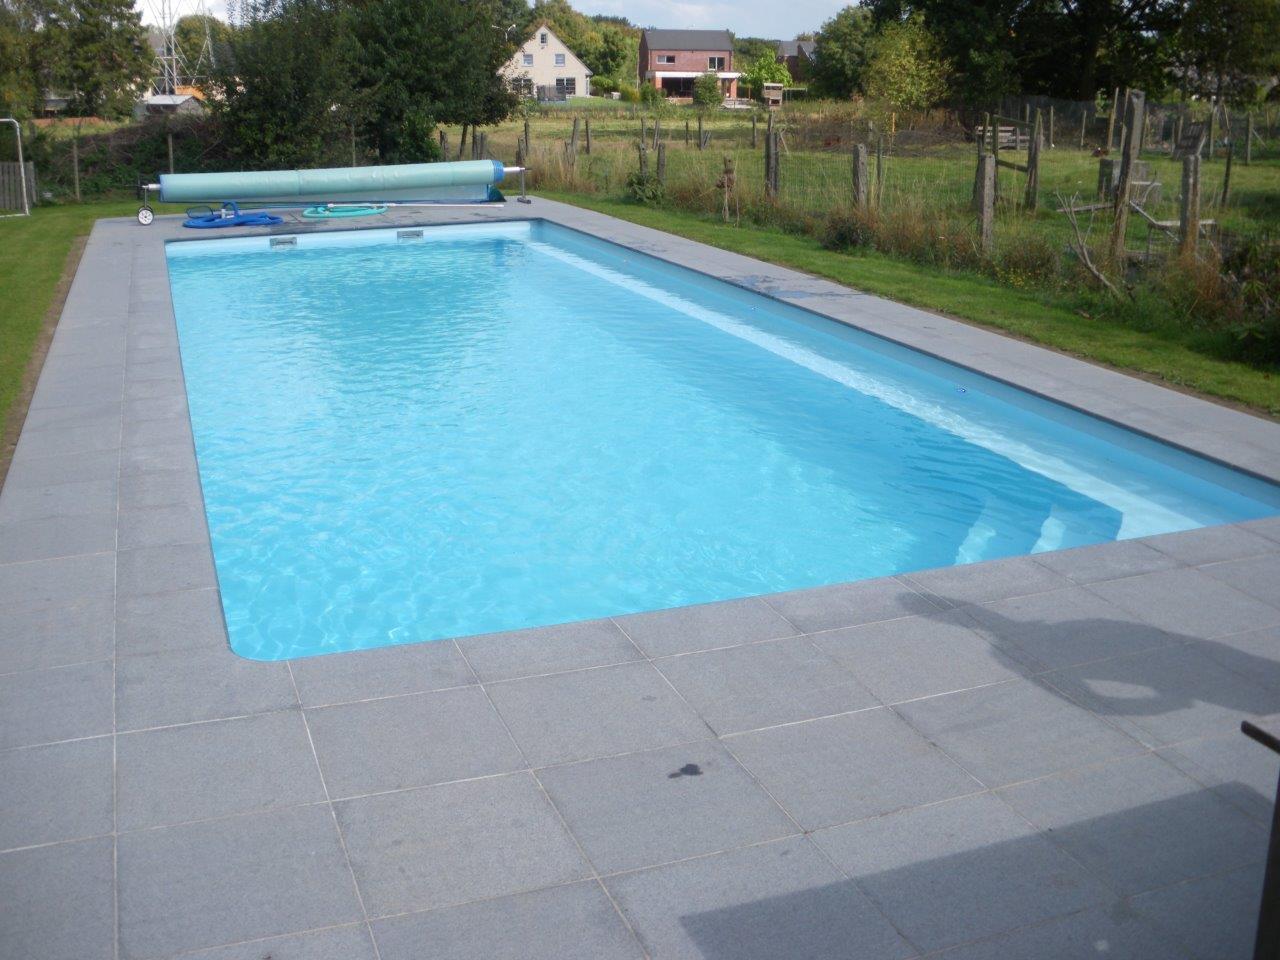 rolluik pool-center 2